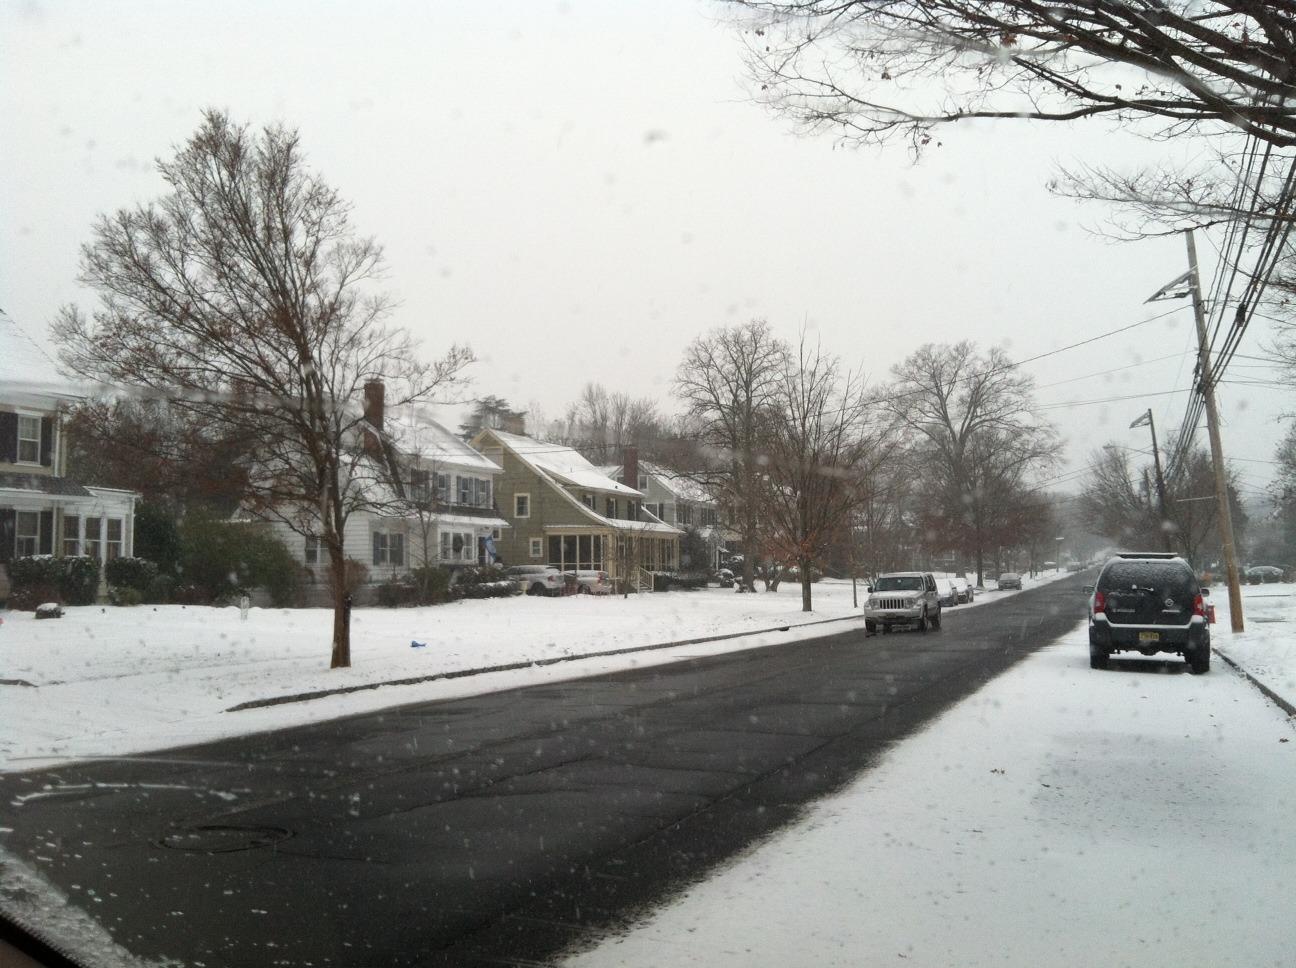 fcf18aee8b98bd95ded8_snow_covered_road.jpg